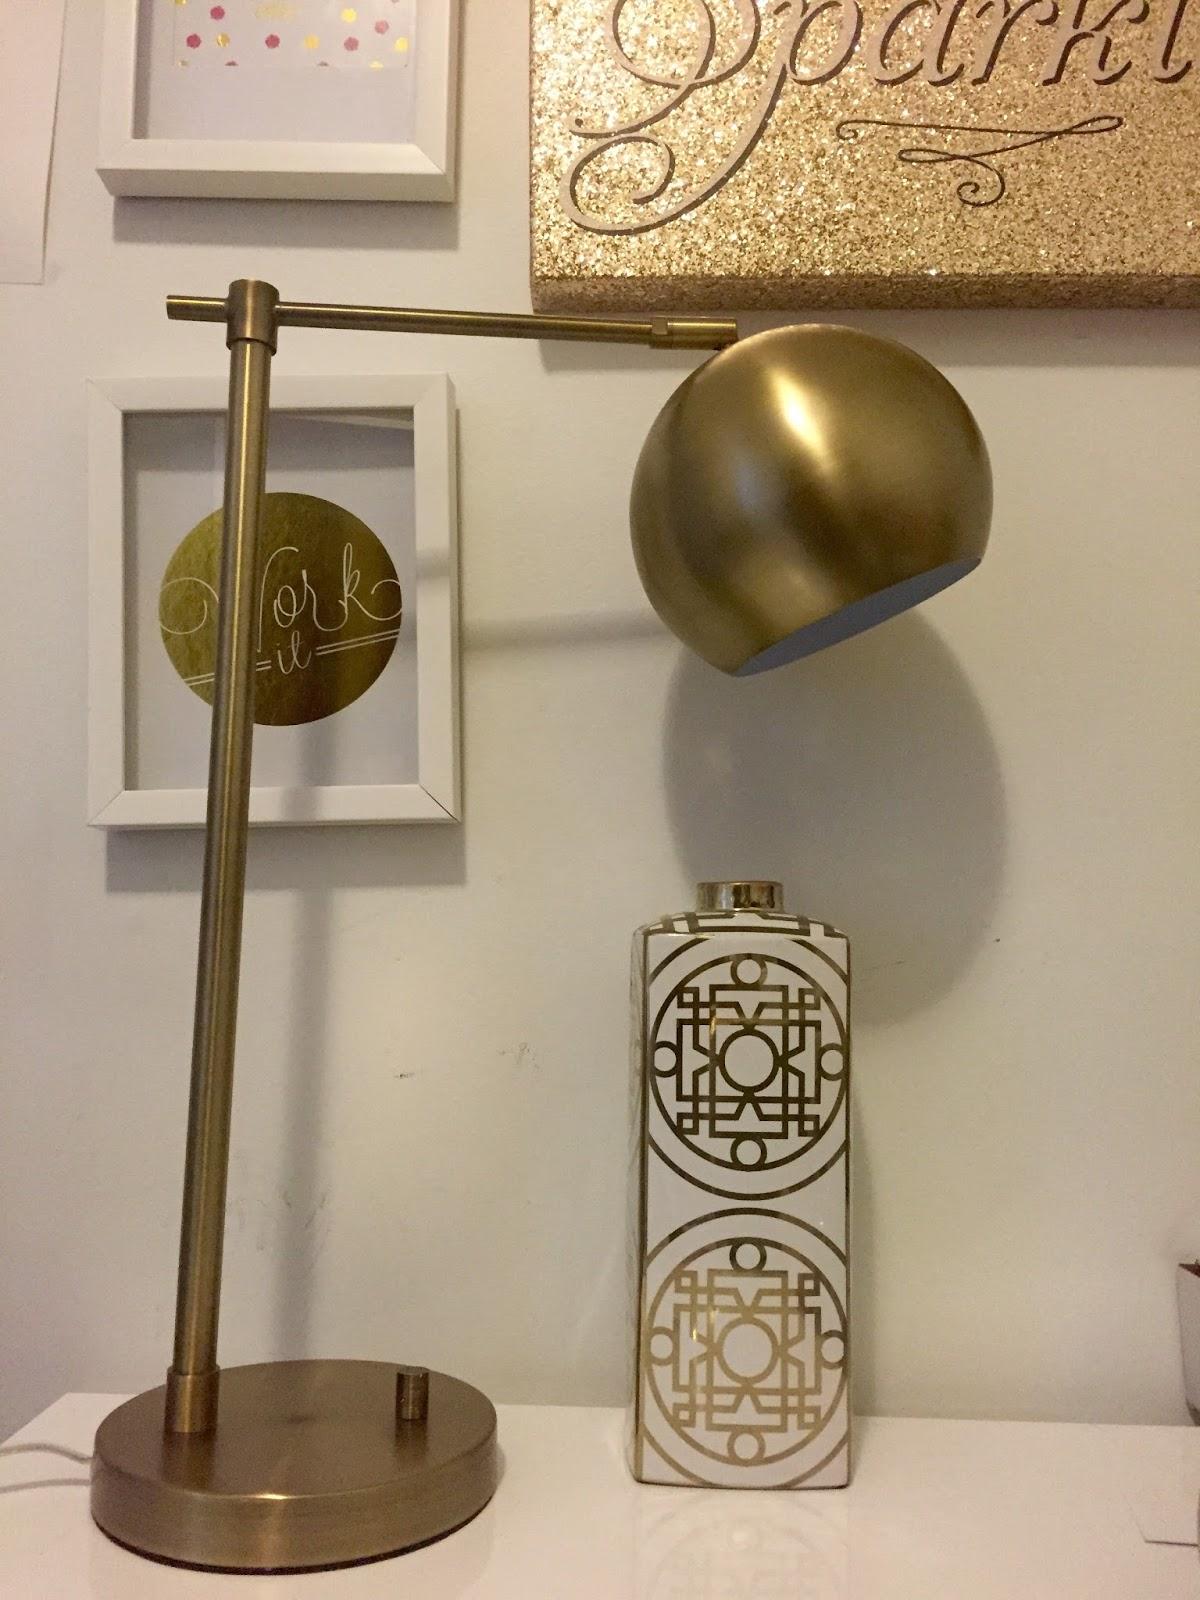 Luxaholic} A Bold & Brassy Desk Lamp #DecorateMyFlat | Curvatude ...